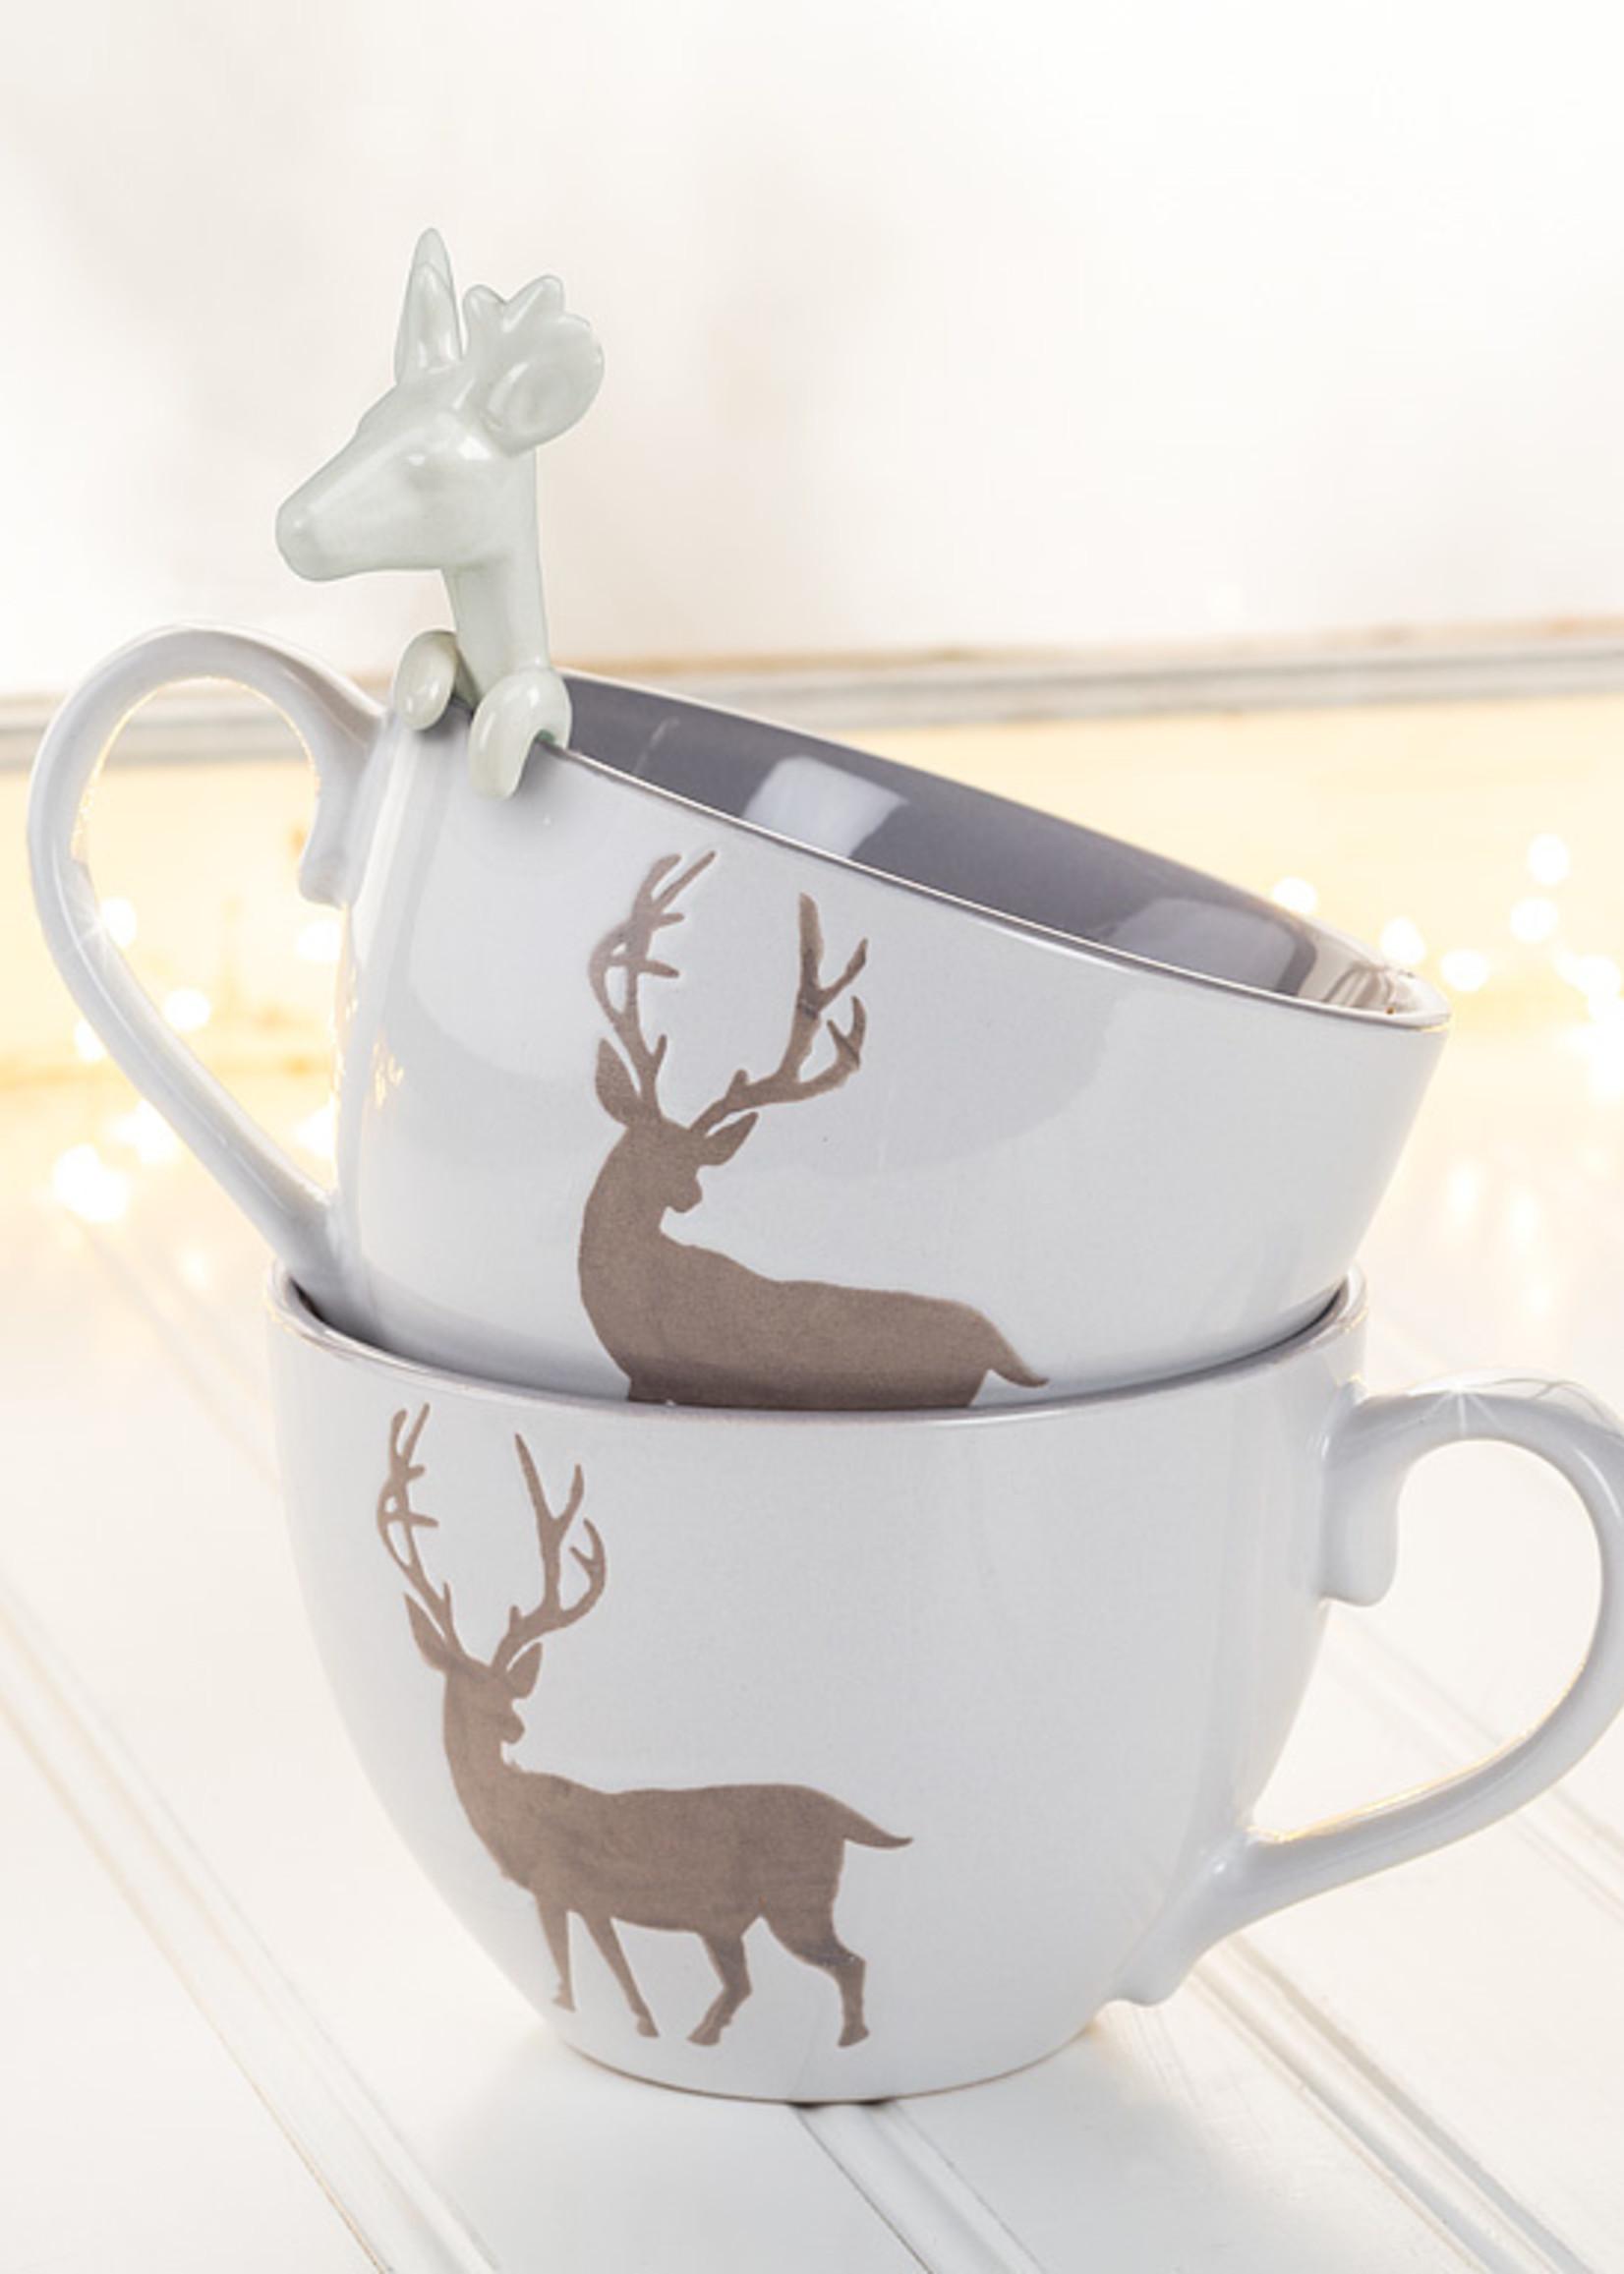 Abbott Reindeer Spoon white